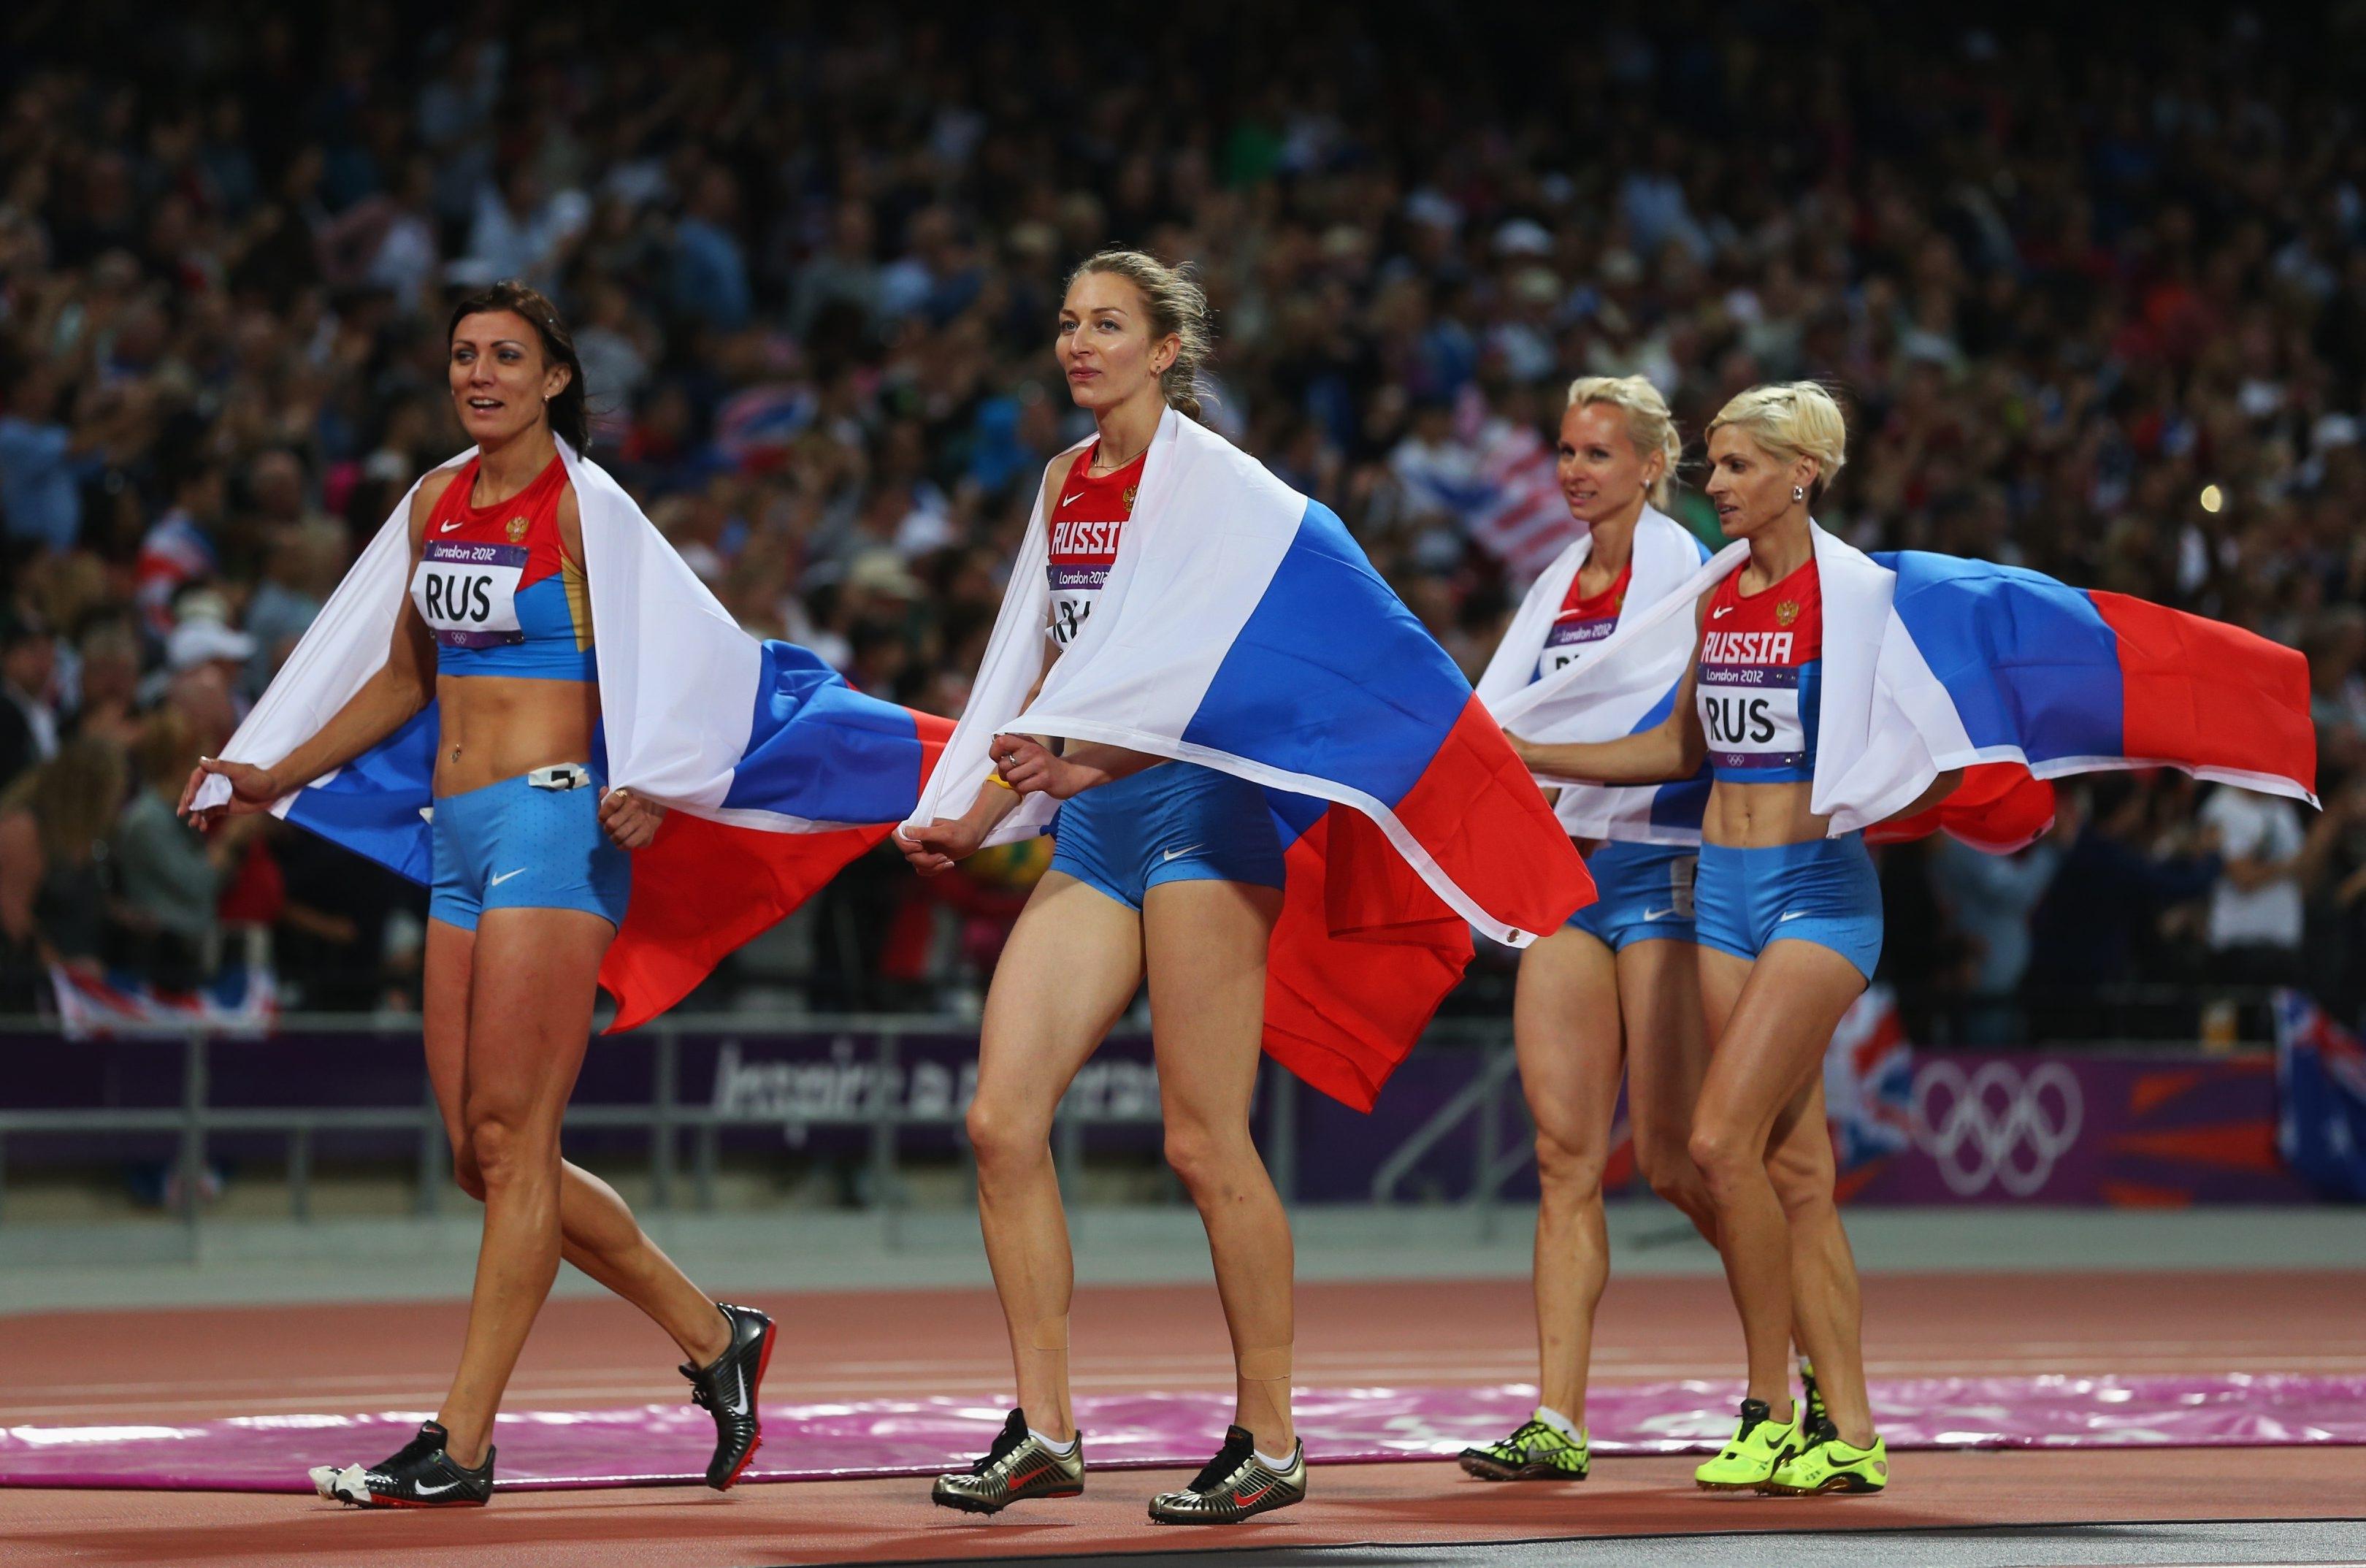 Natalya Antyukh, Tatyana Firova, Yulia Gushchina and Antonina Krivoshapka of Russia celebrate winning silver in the Women's 4 by 400 meter relay final at the London Olympics in 2012.